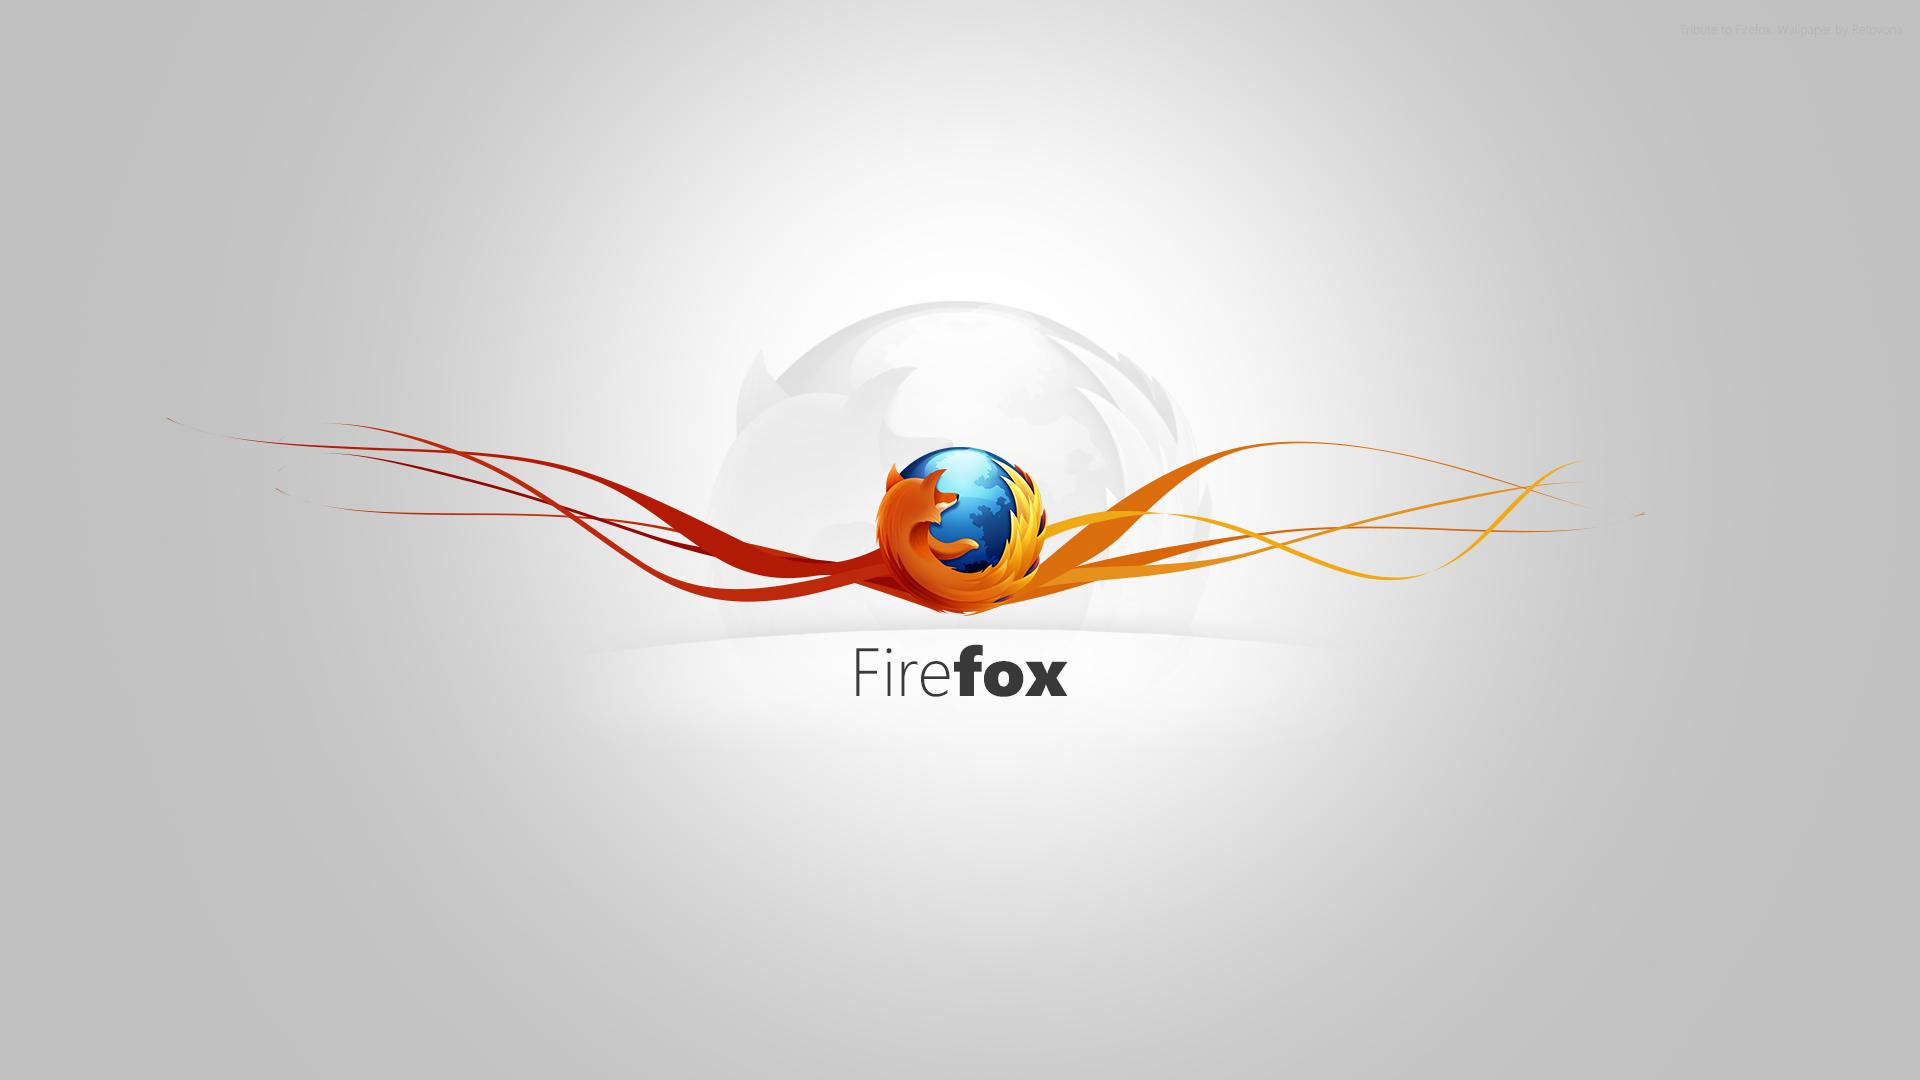 Firefox Wallpapers 26